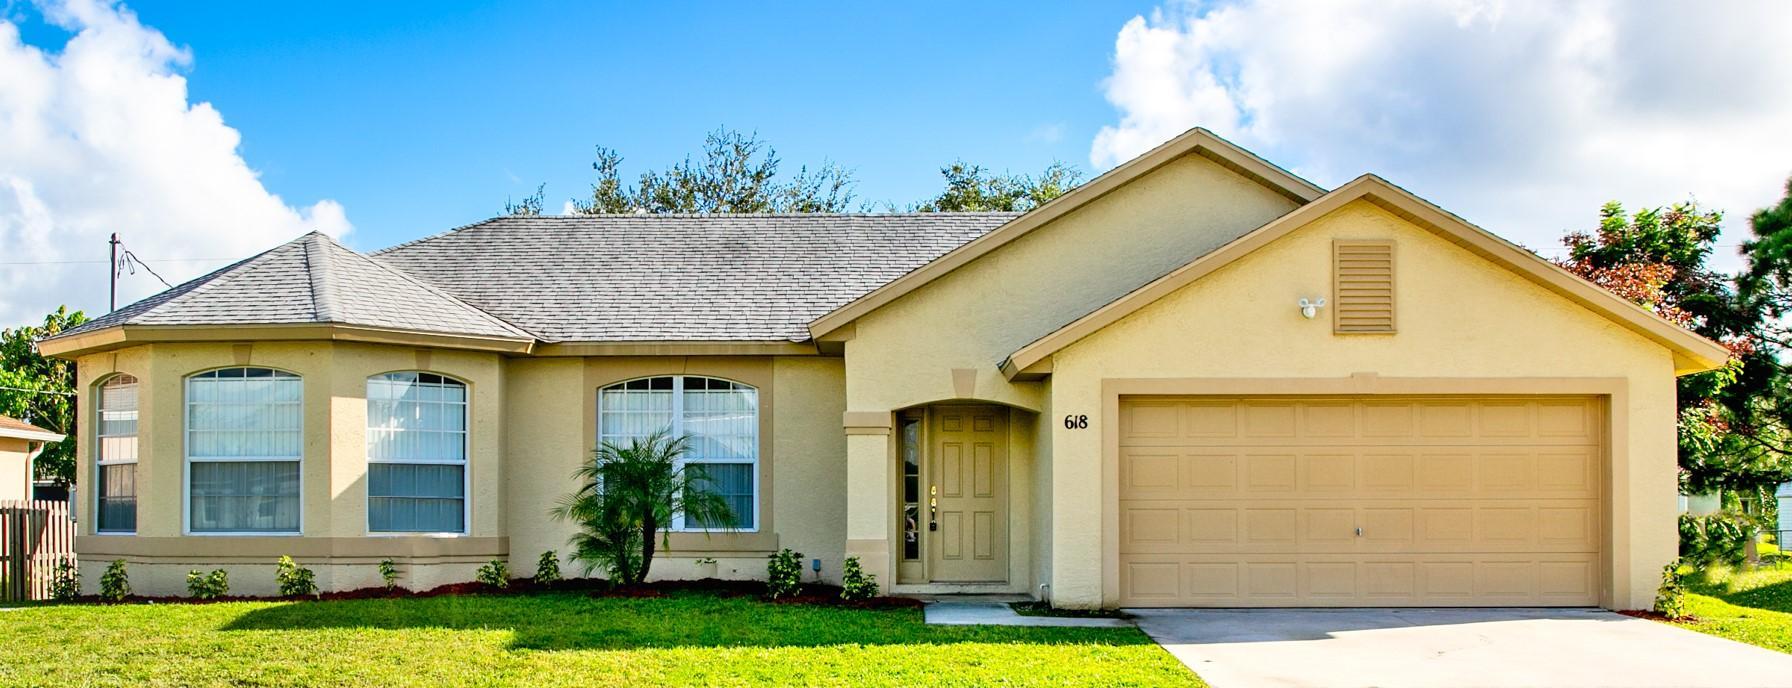 618 Sw Colleen Avenue, Port Saint Lucie, FL 34983